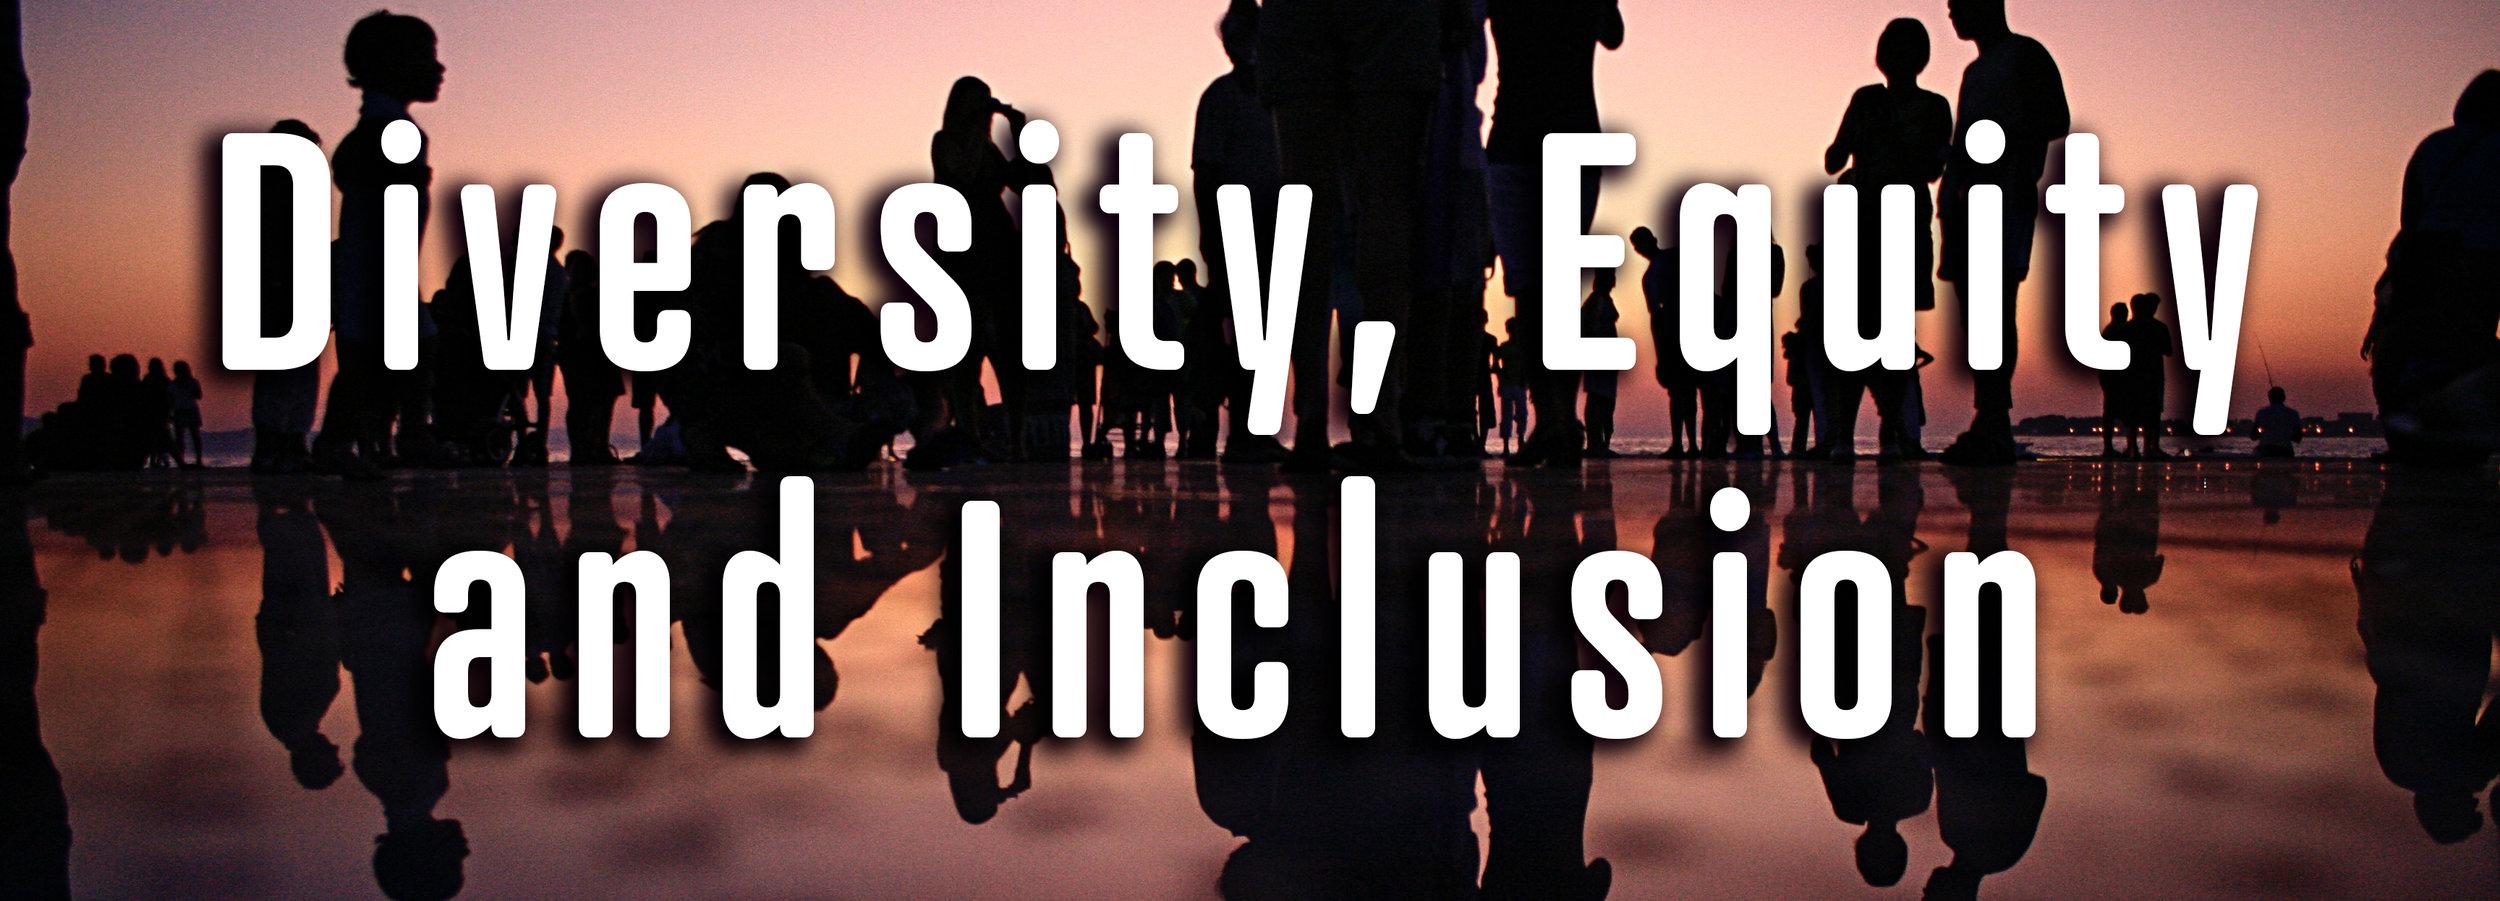 Diversity 2.jpg